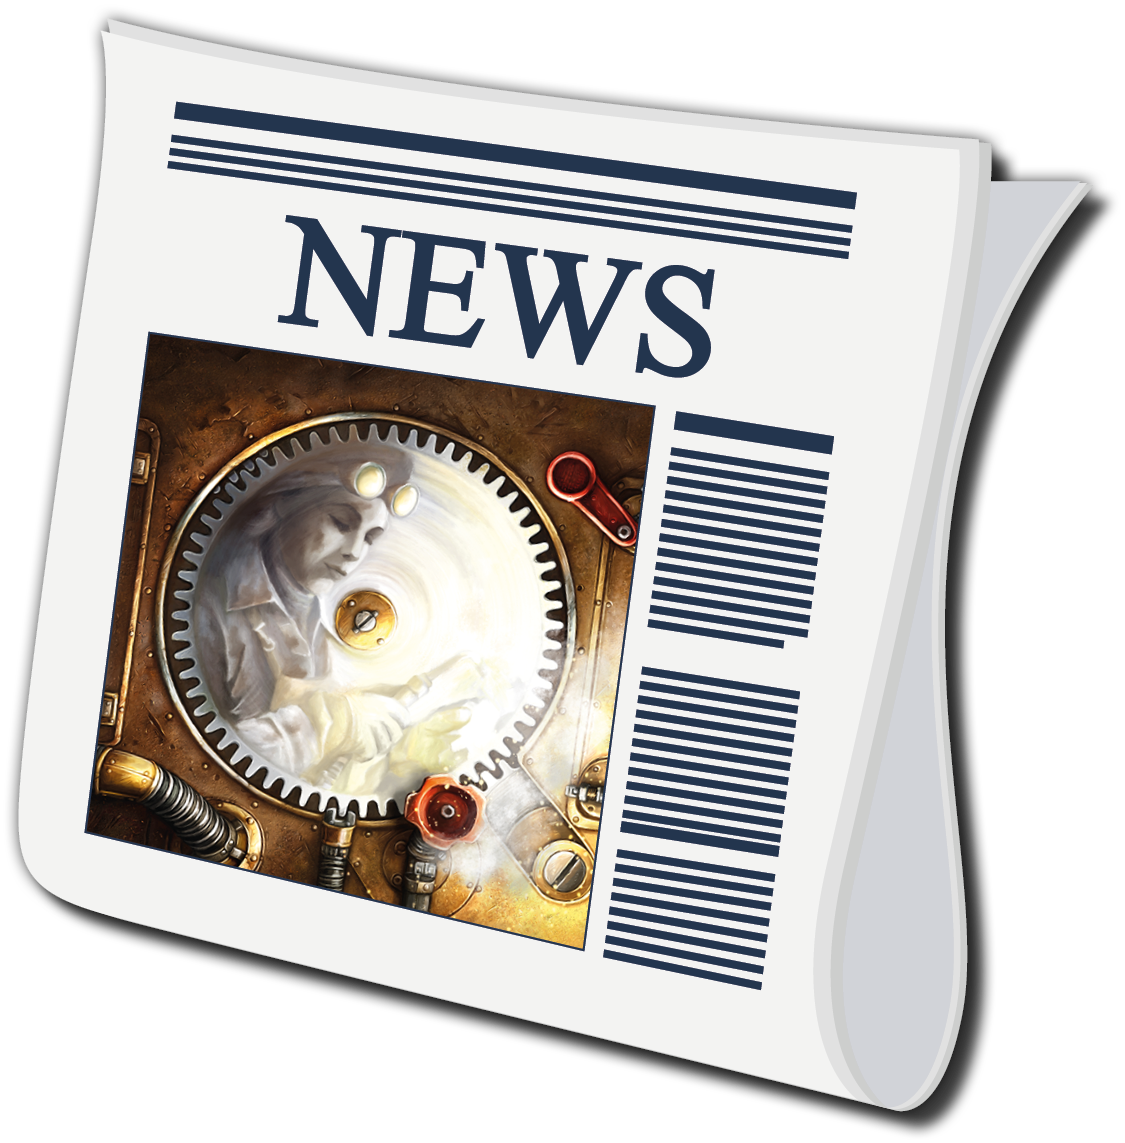 News Corrosion